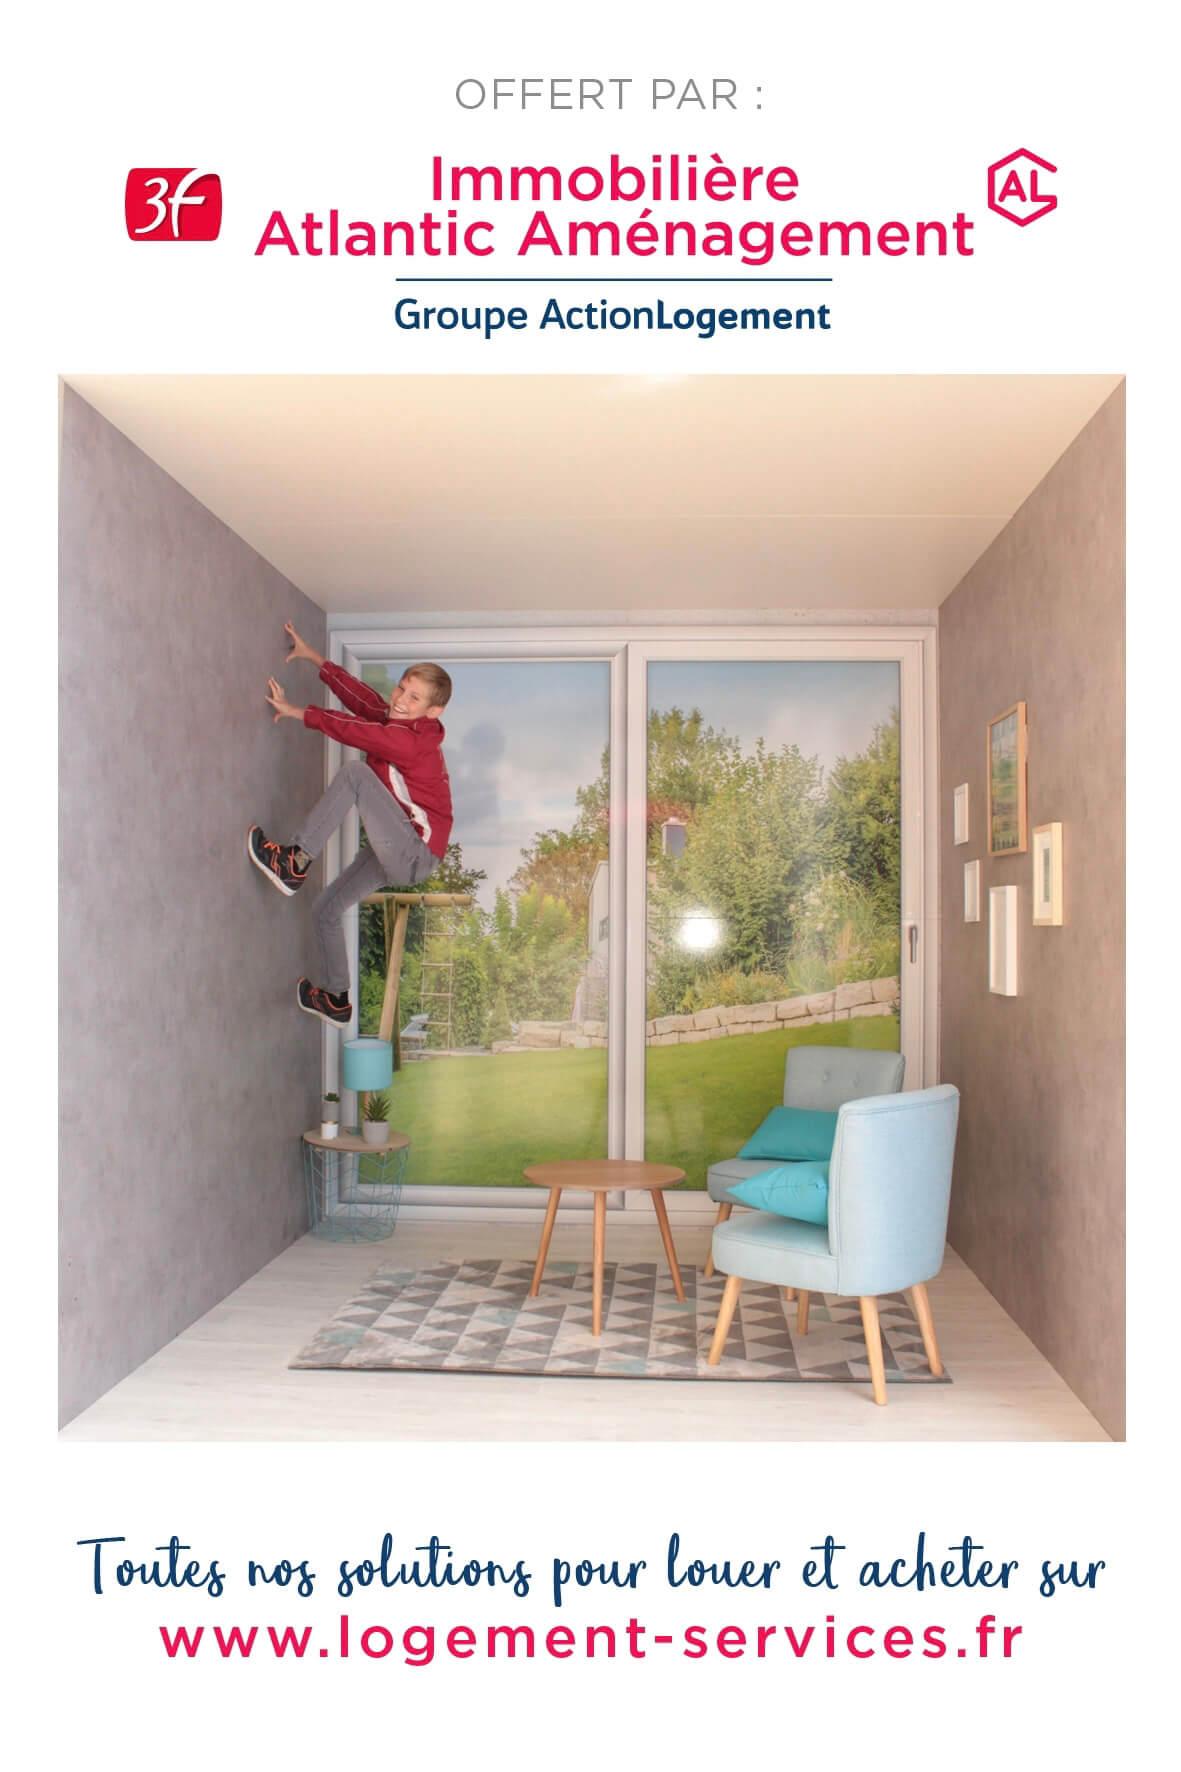 lehman-studio-photographe-angers-evenementiel-gravitybox-ambiance-maison-groupe-action-logement